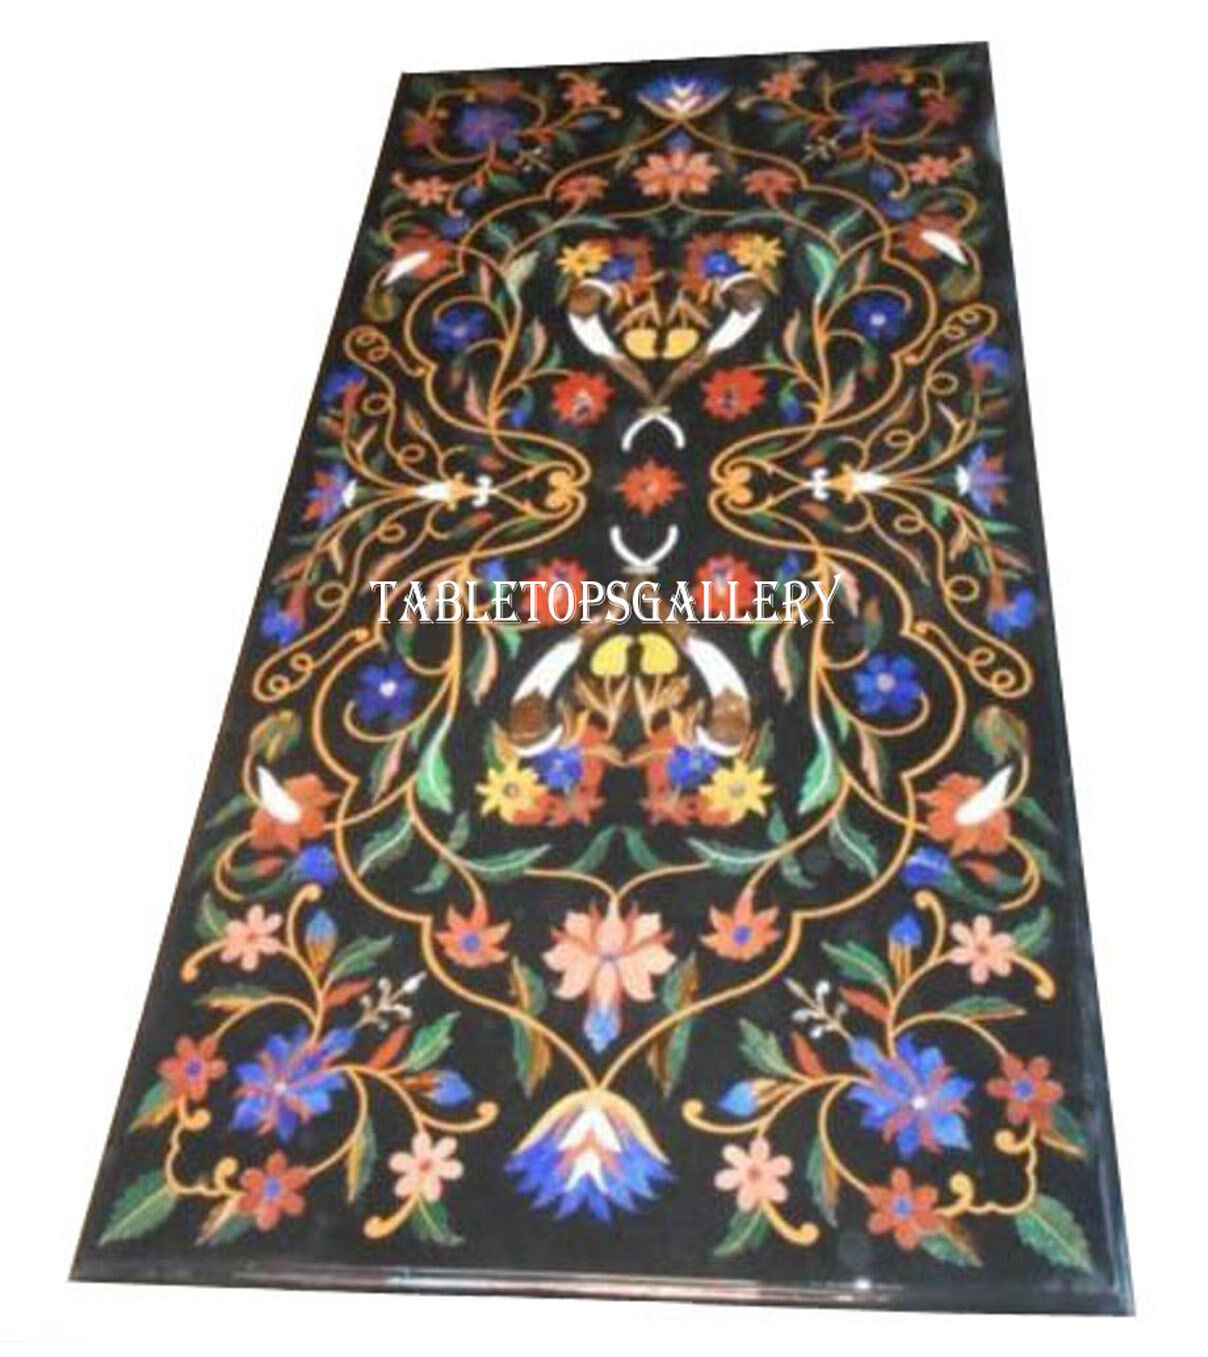 4'x2' Black Marble Dining Table Top Lapis Gems Inlaid Mosaic Garden Decor H2440